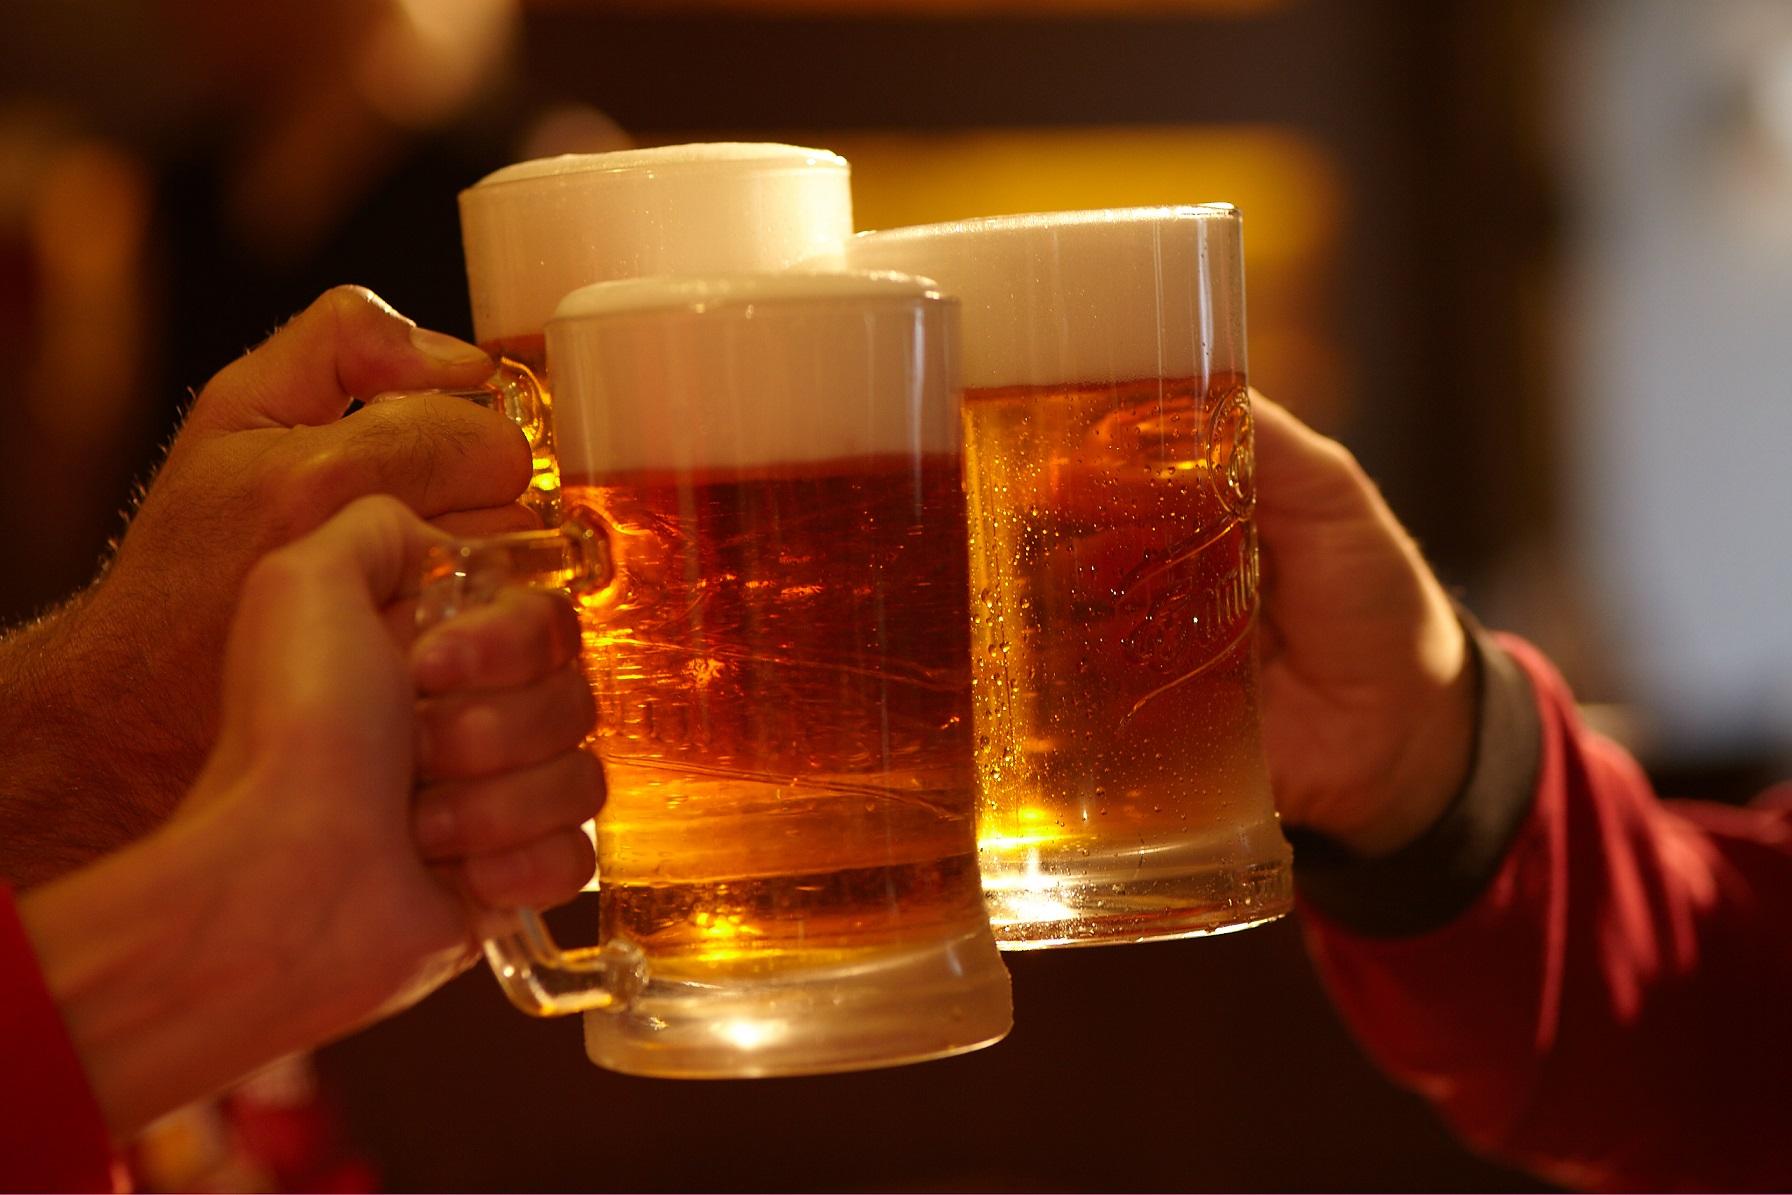 Globalno zagrevanje nam donosi skuplje pivo, vino i kafu